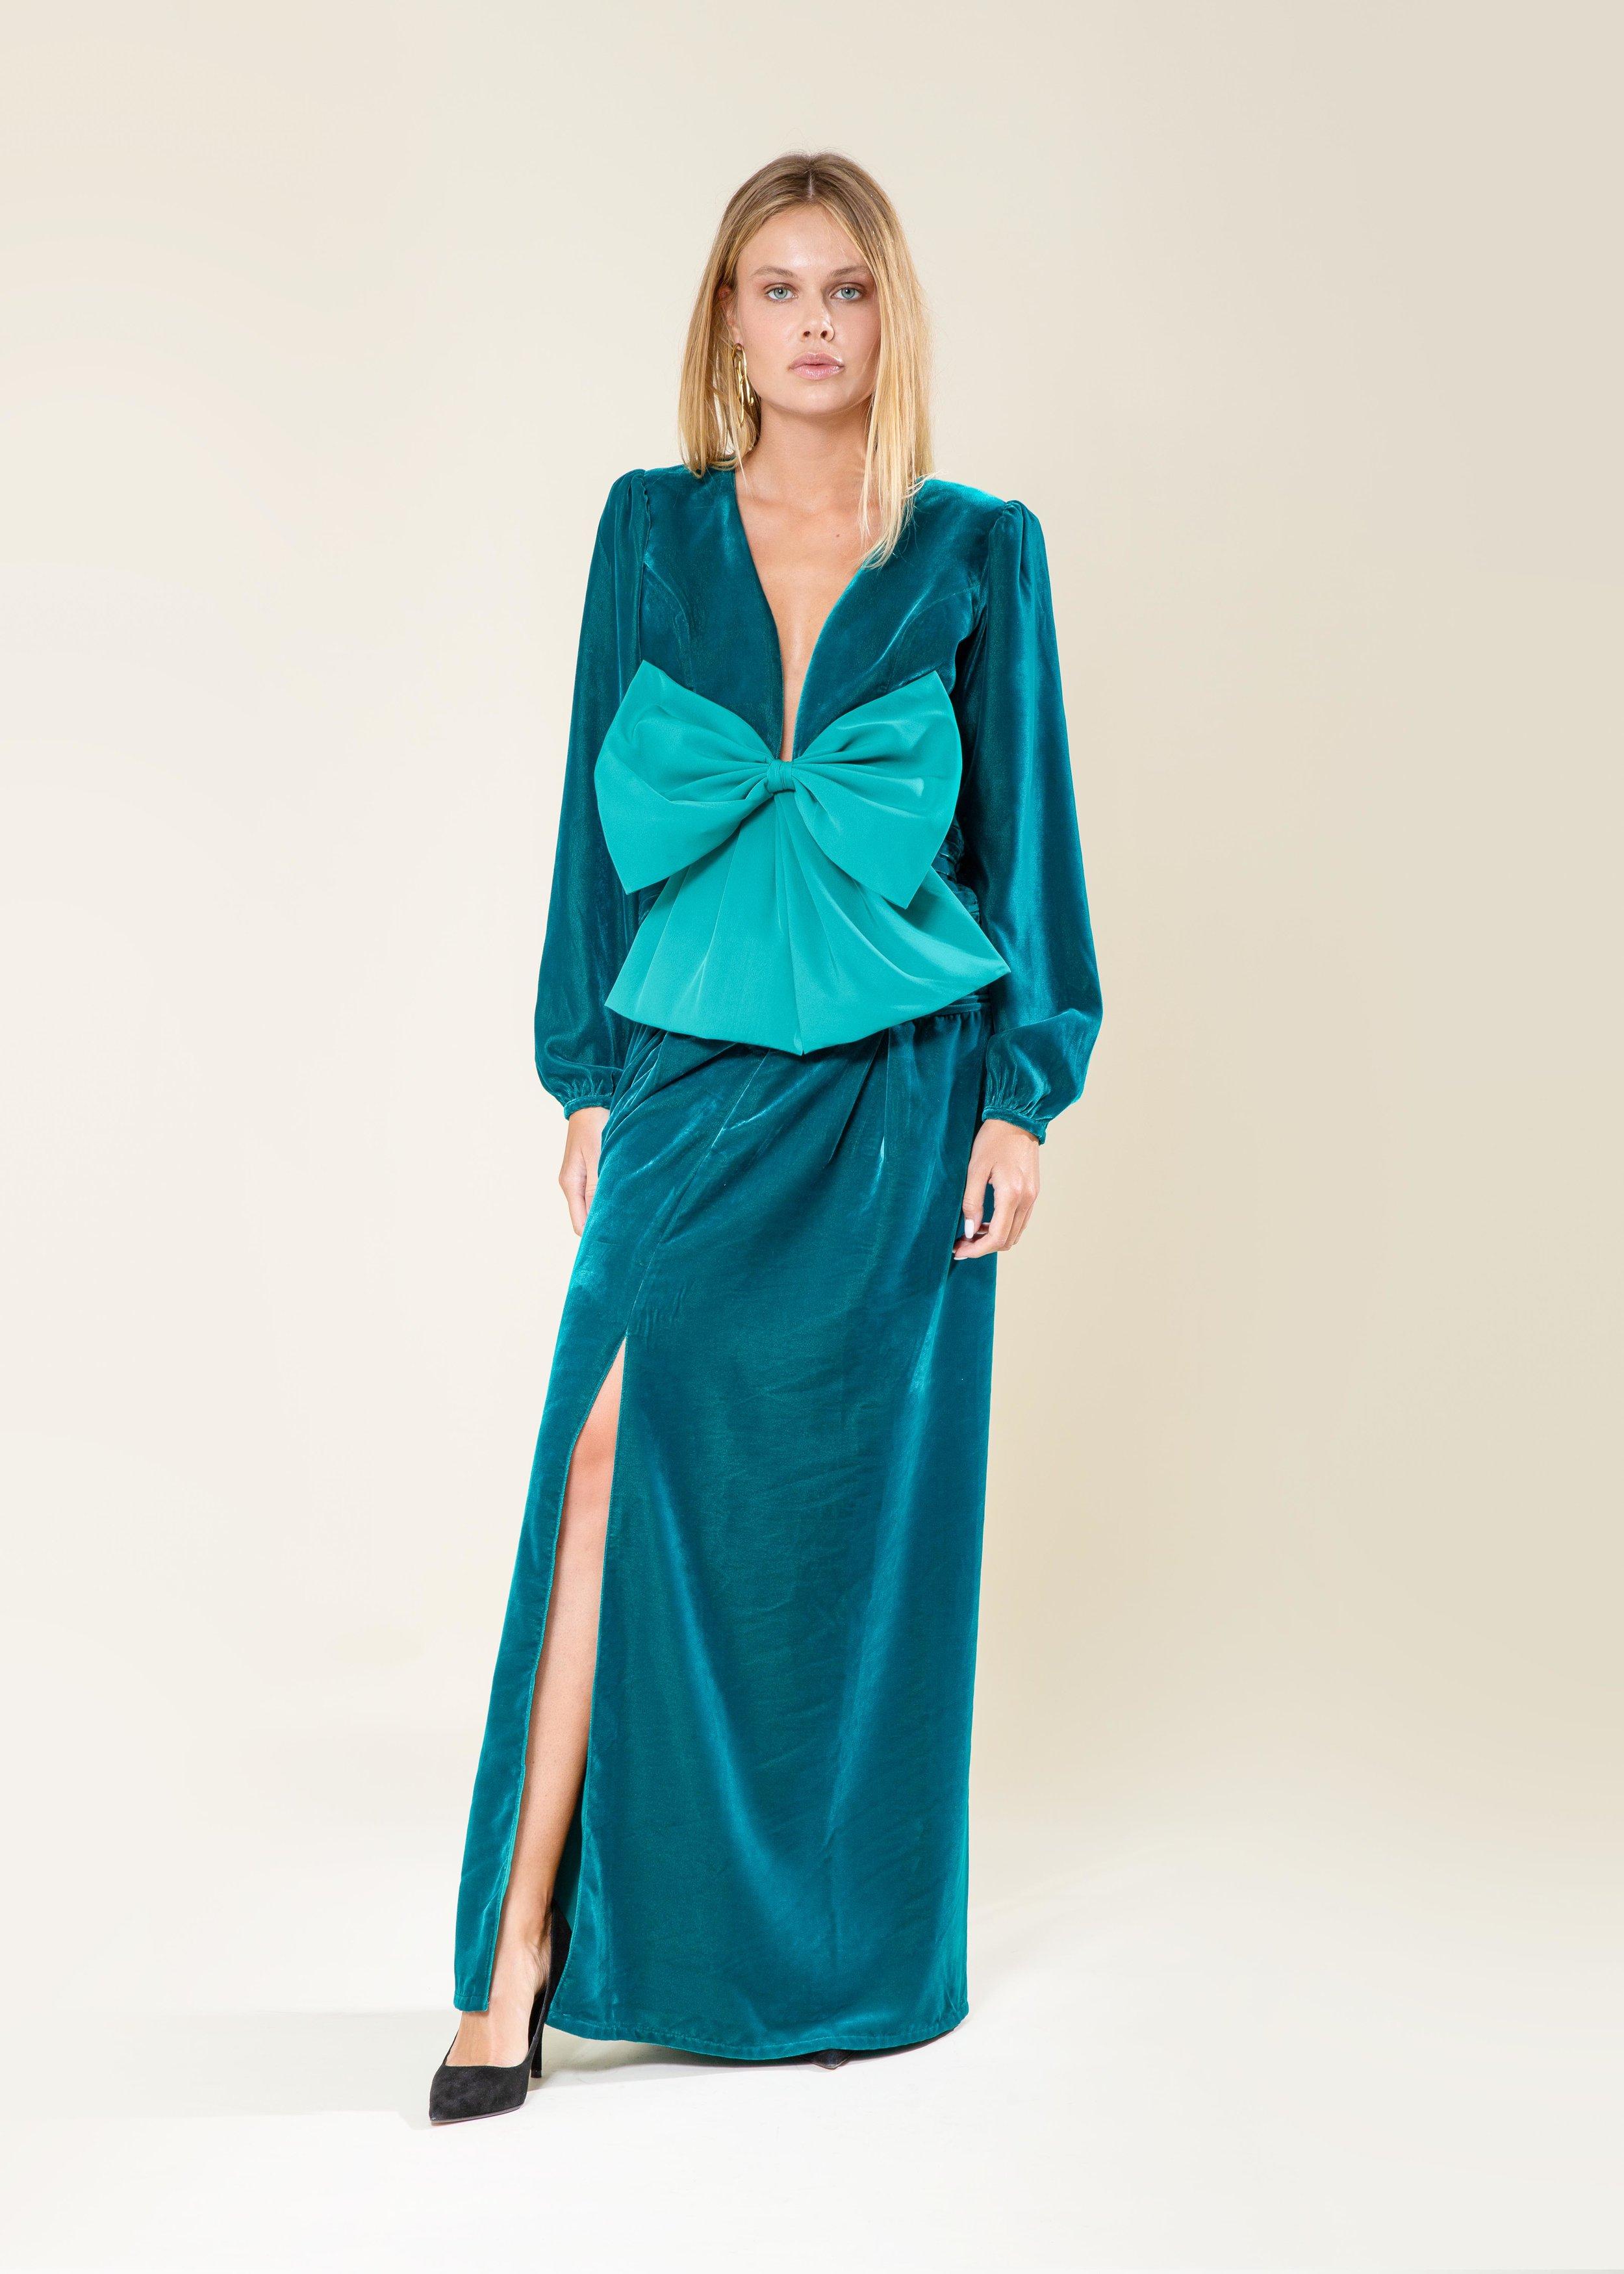 amy-dress.jpg